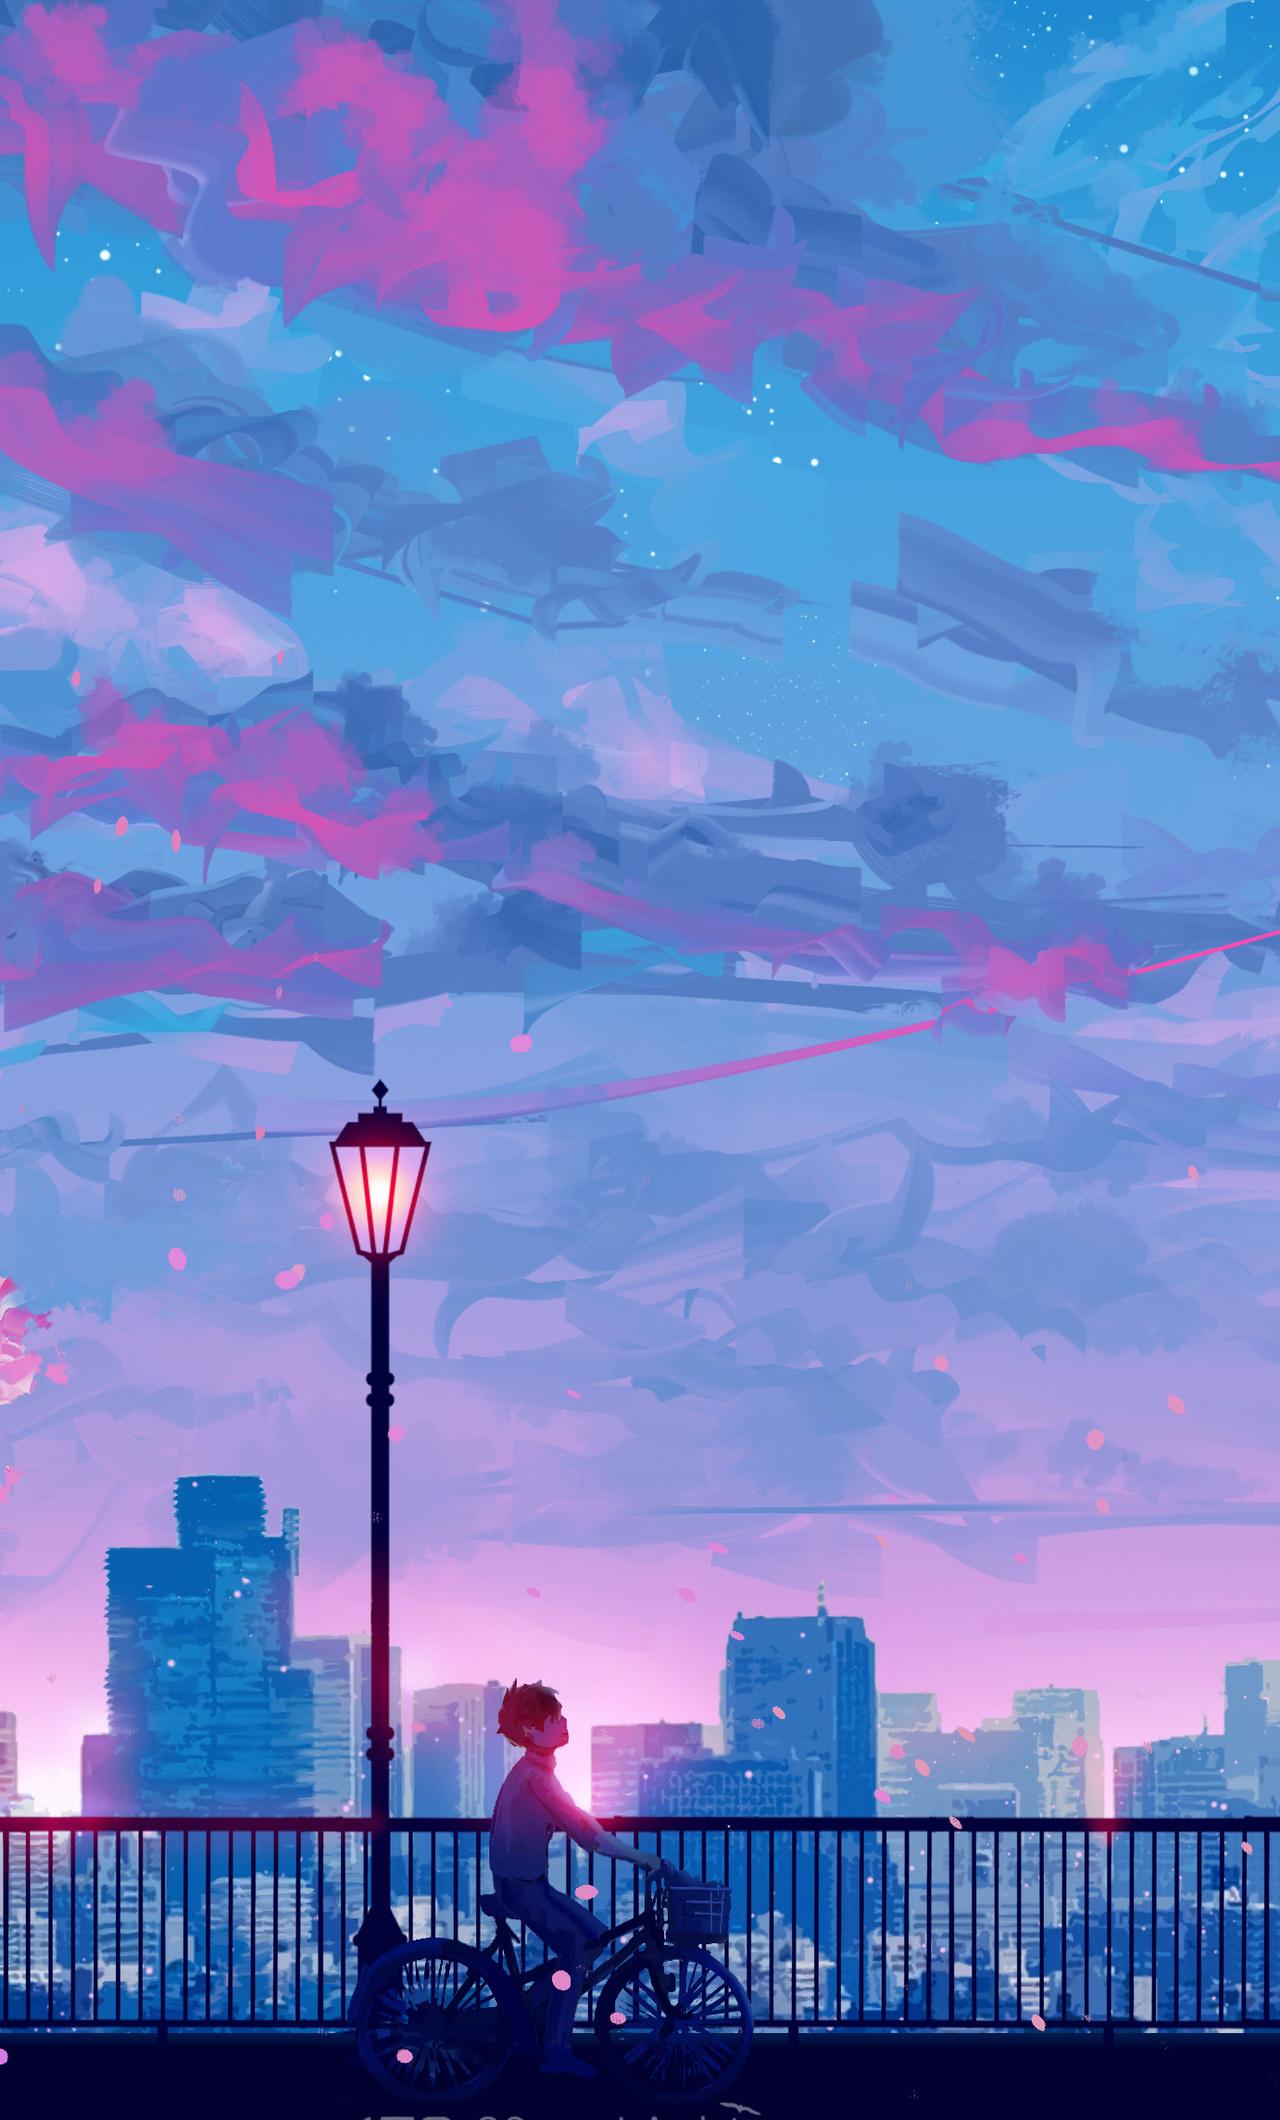 1280x2120 Anime Cityscape Landscape Scenery 5k Iphone 6 Hd